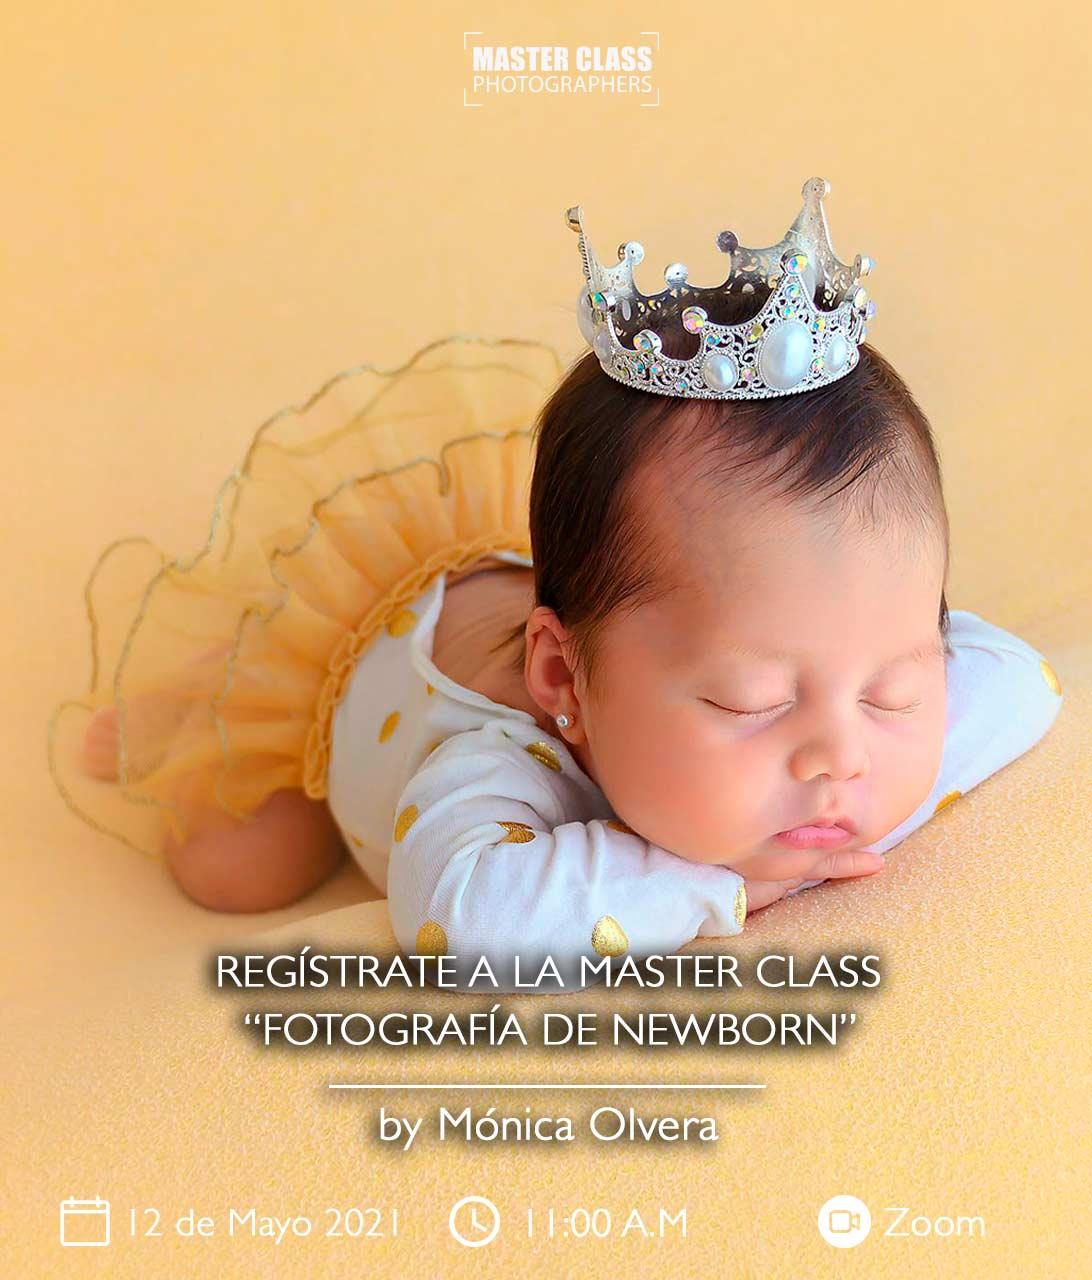 Newborn | Mónica Olvera